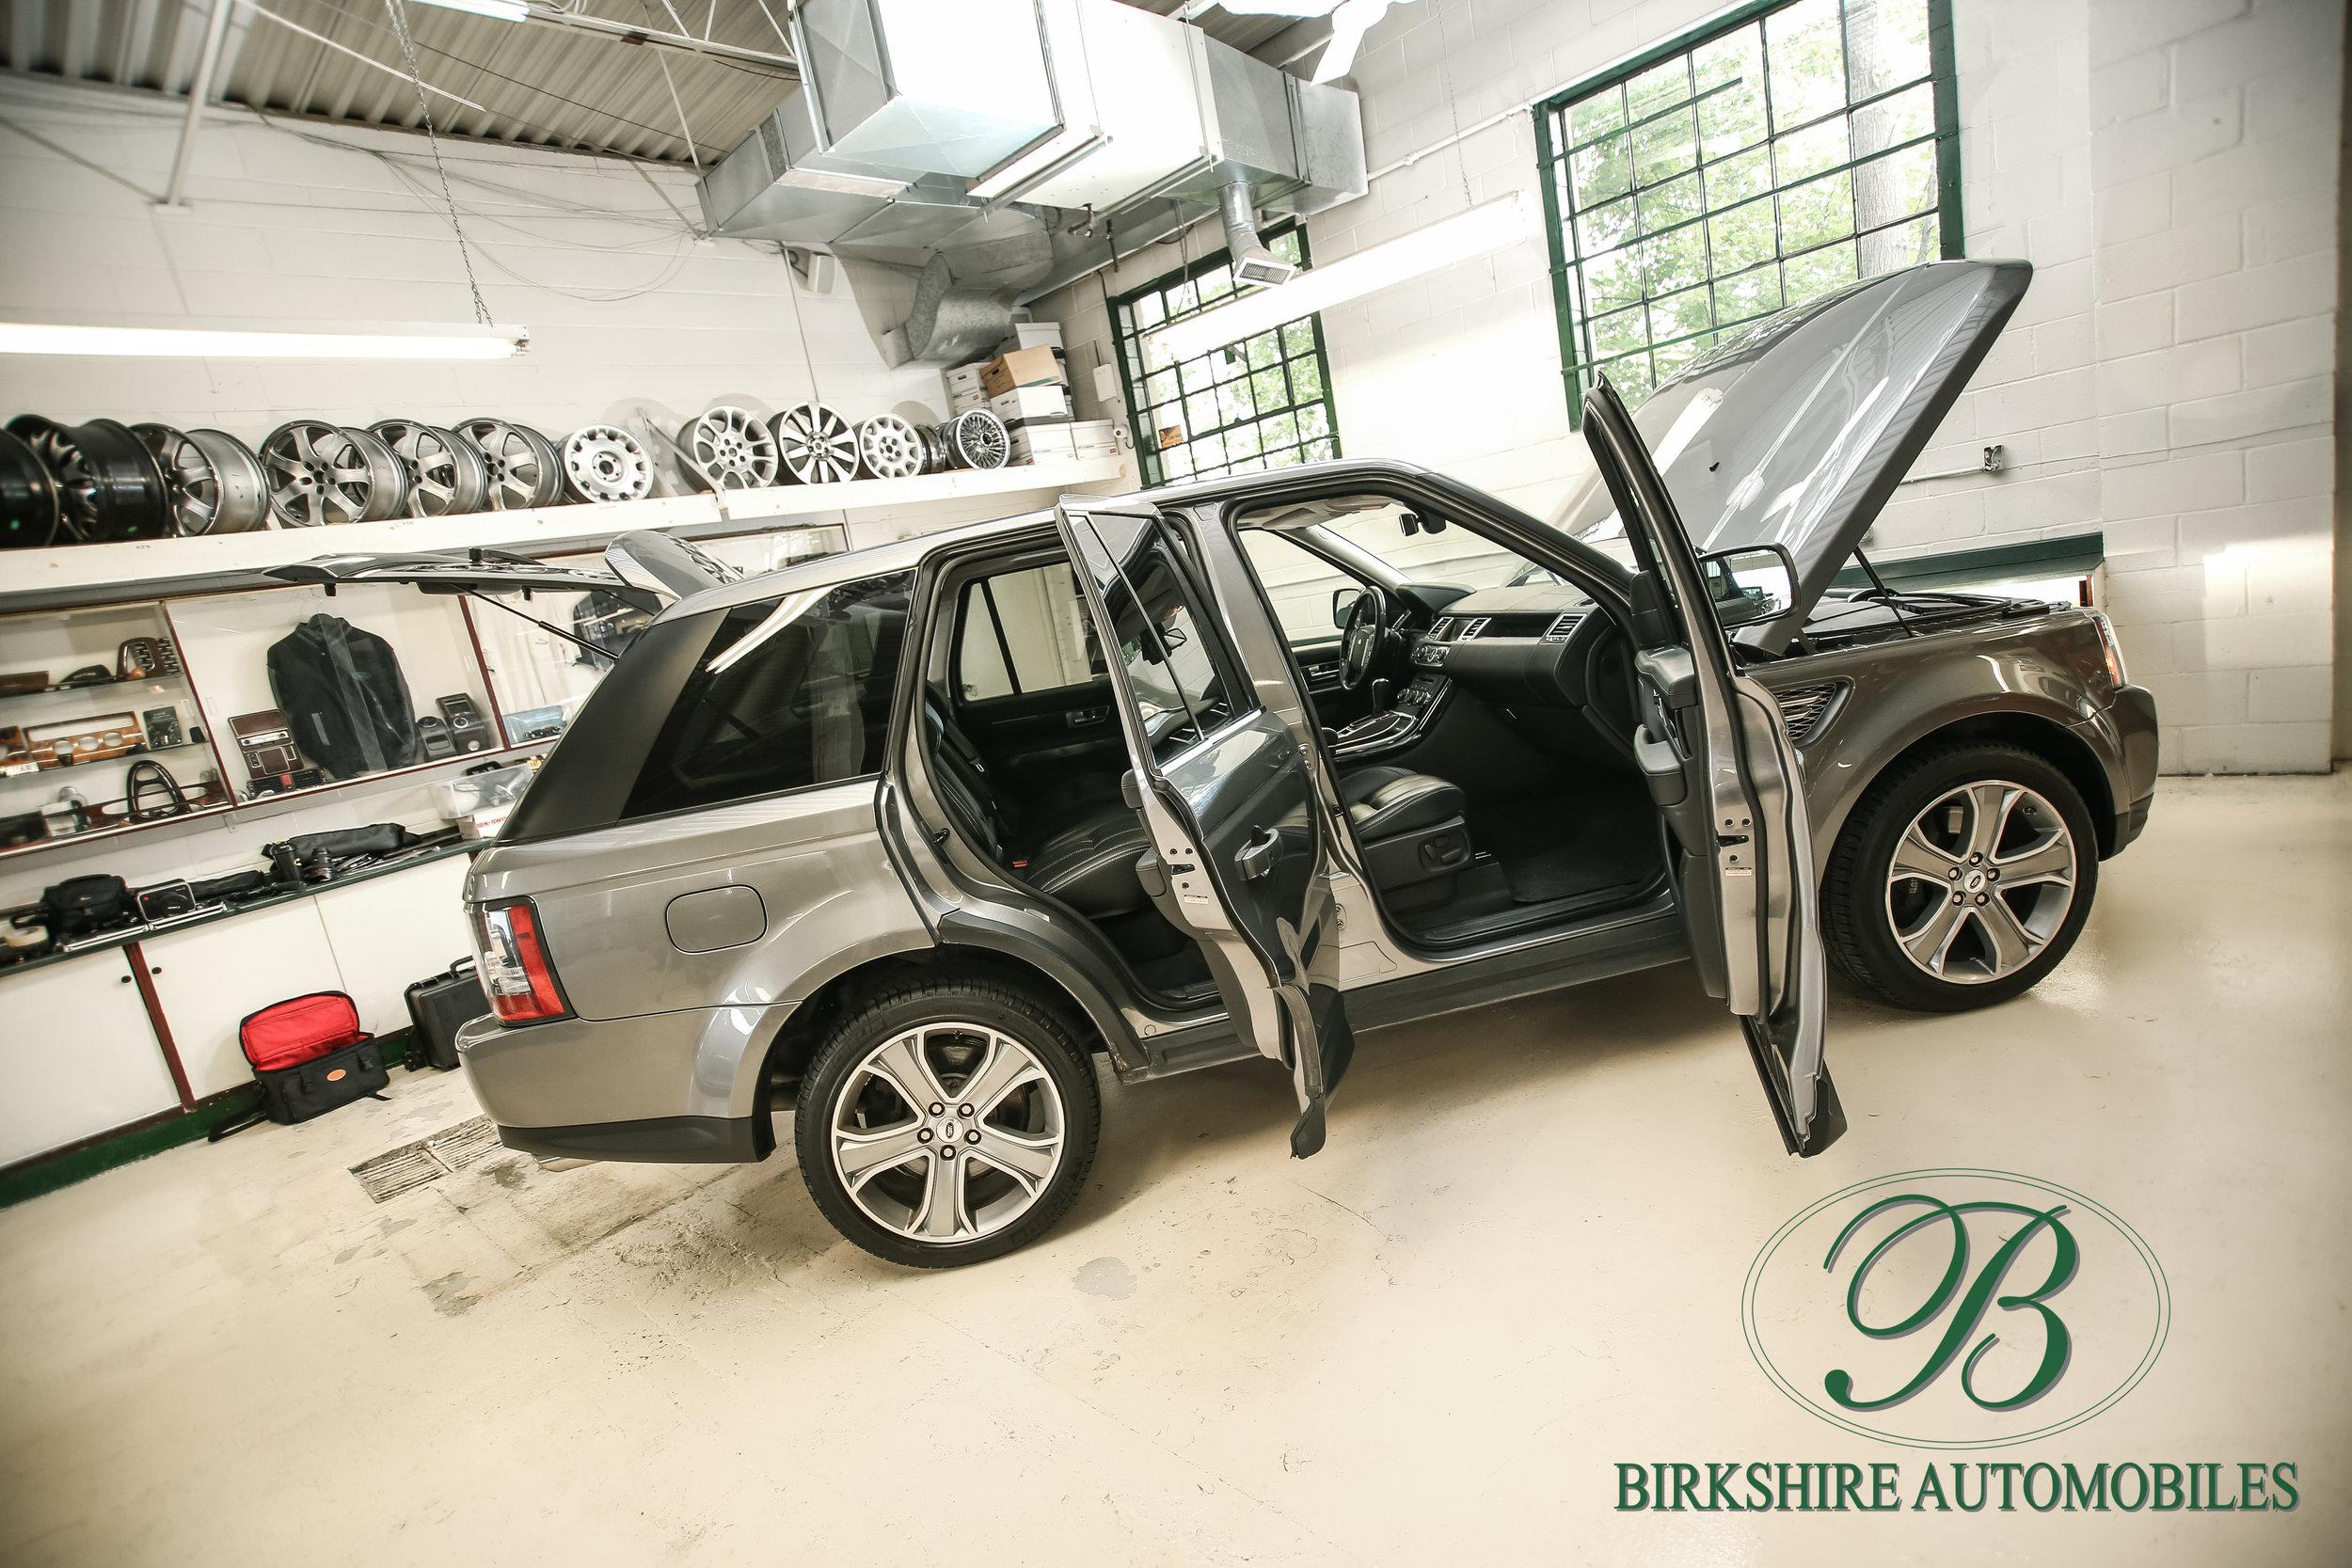 Birkshire Automobiles-43.jpg